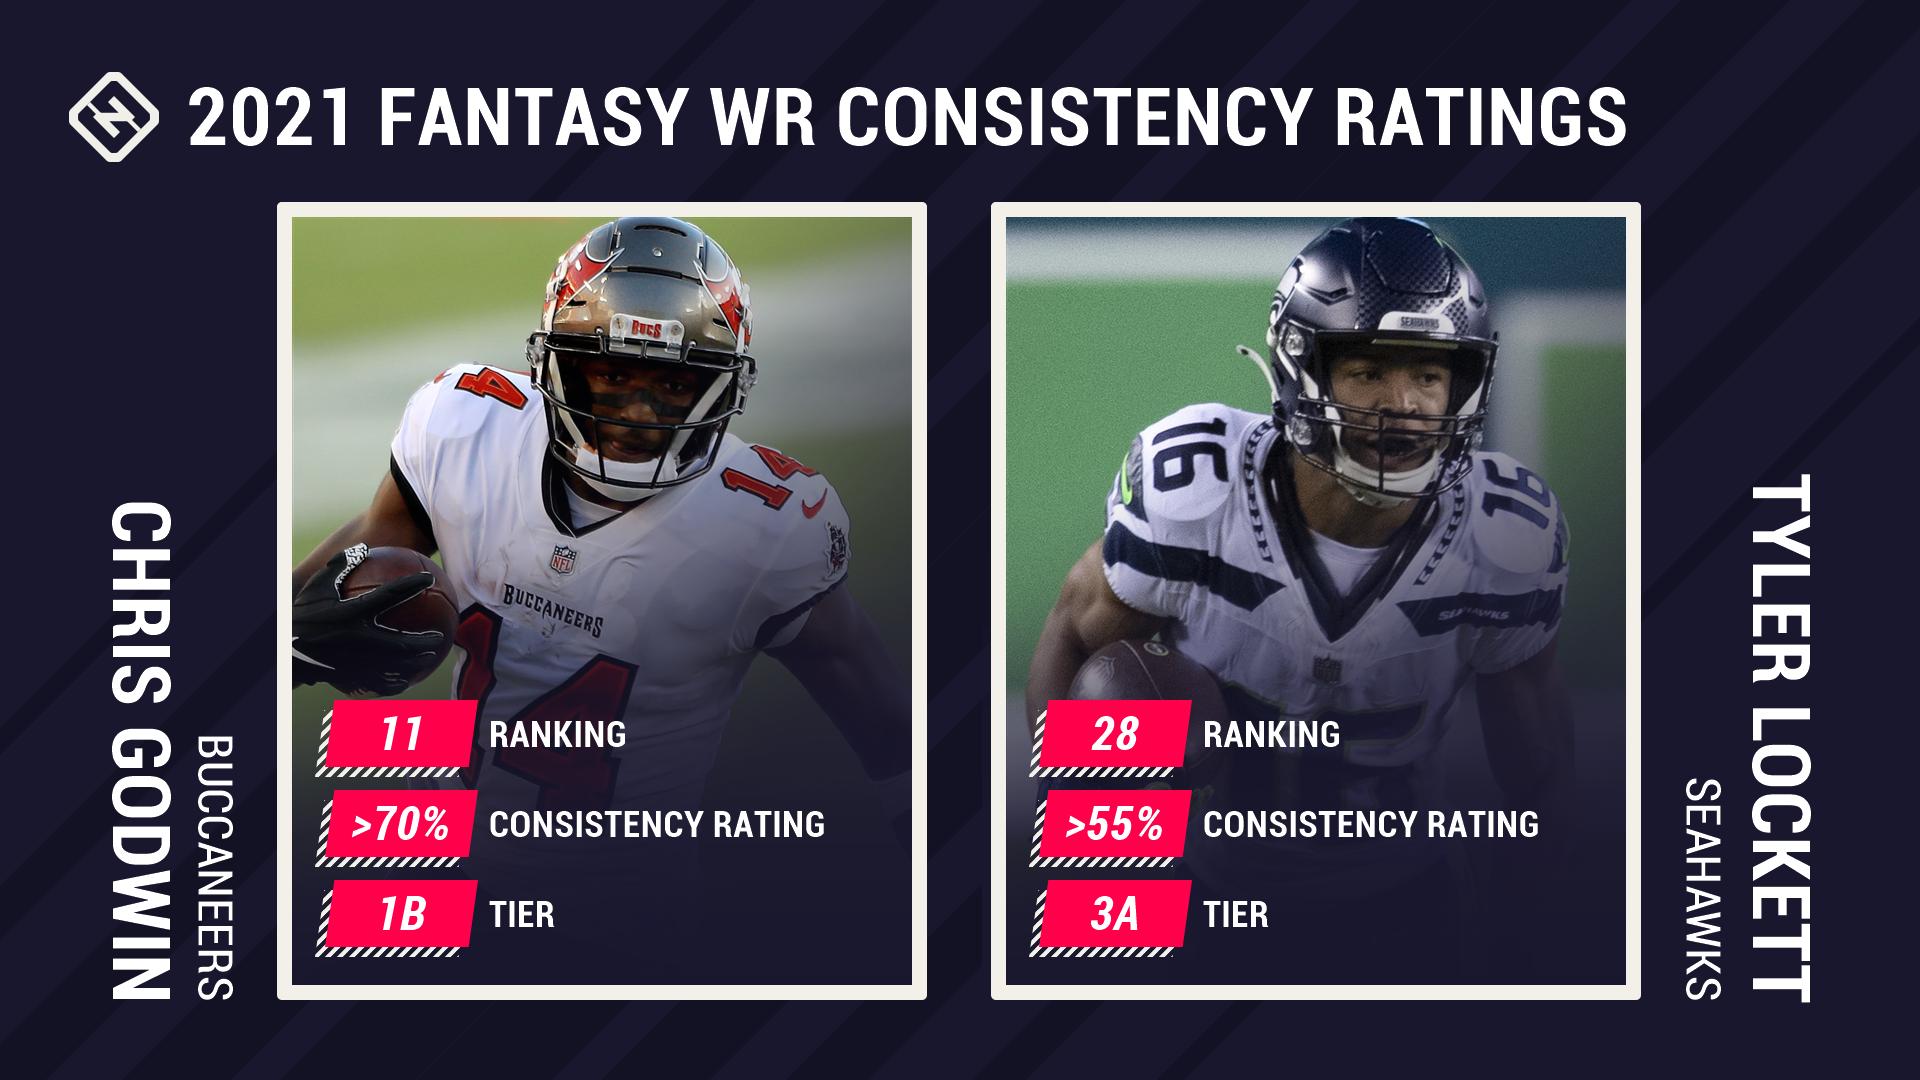 2021 Fantasy Football WR Consistency Ratings